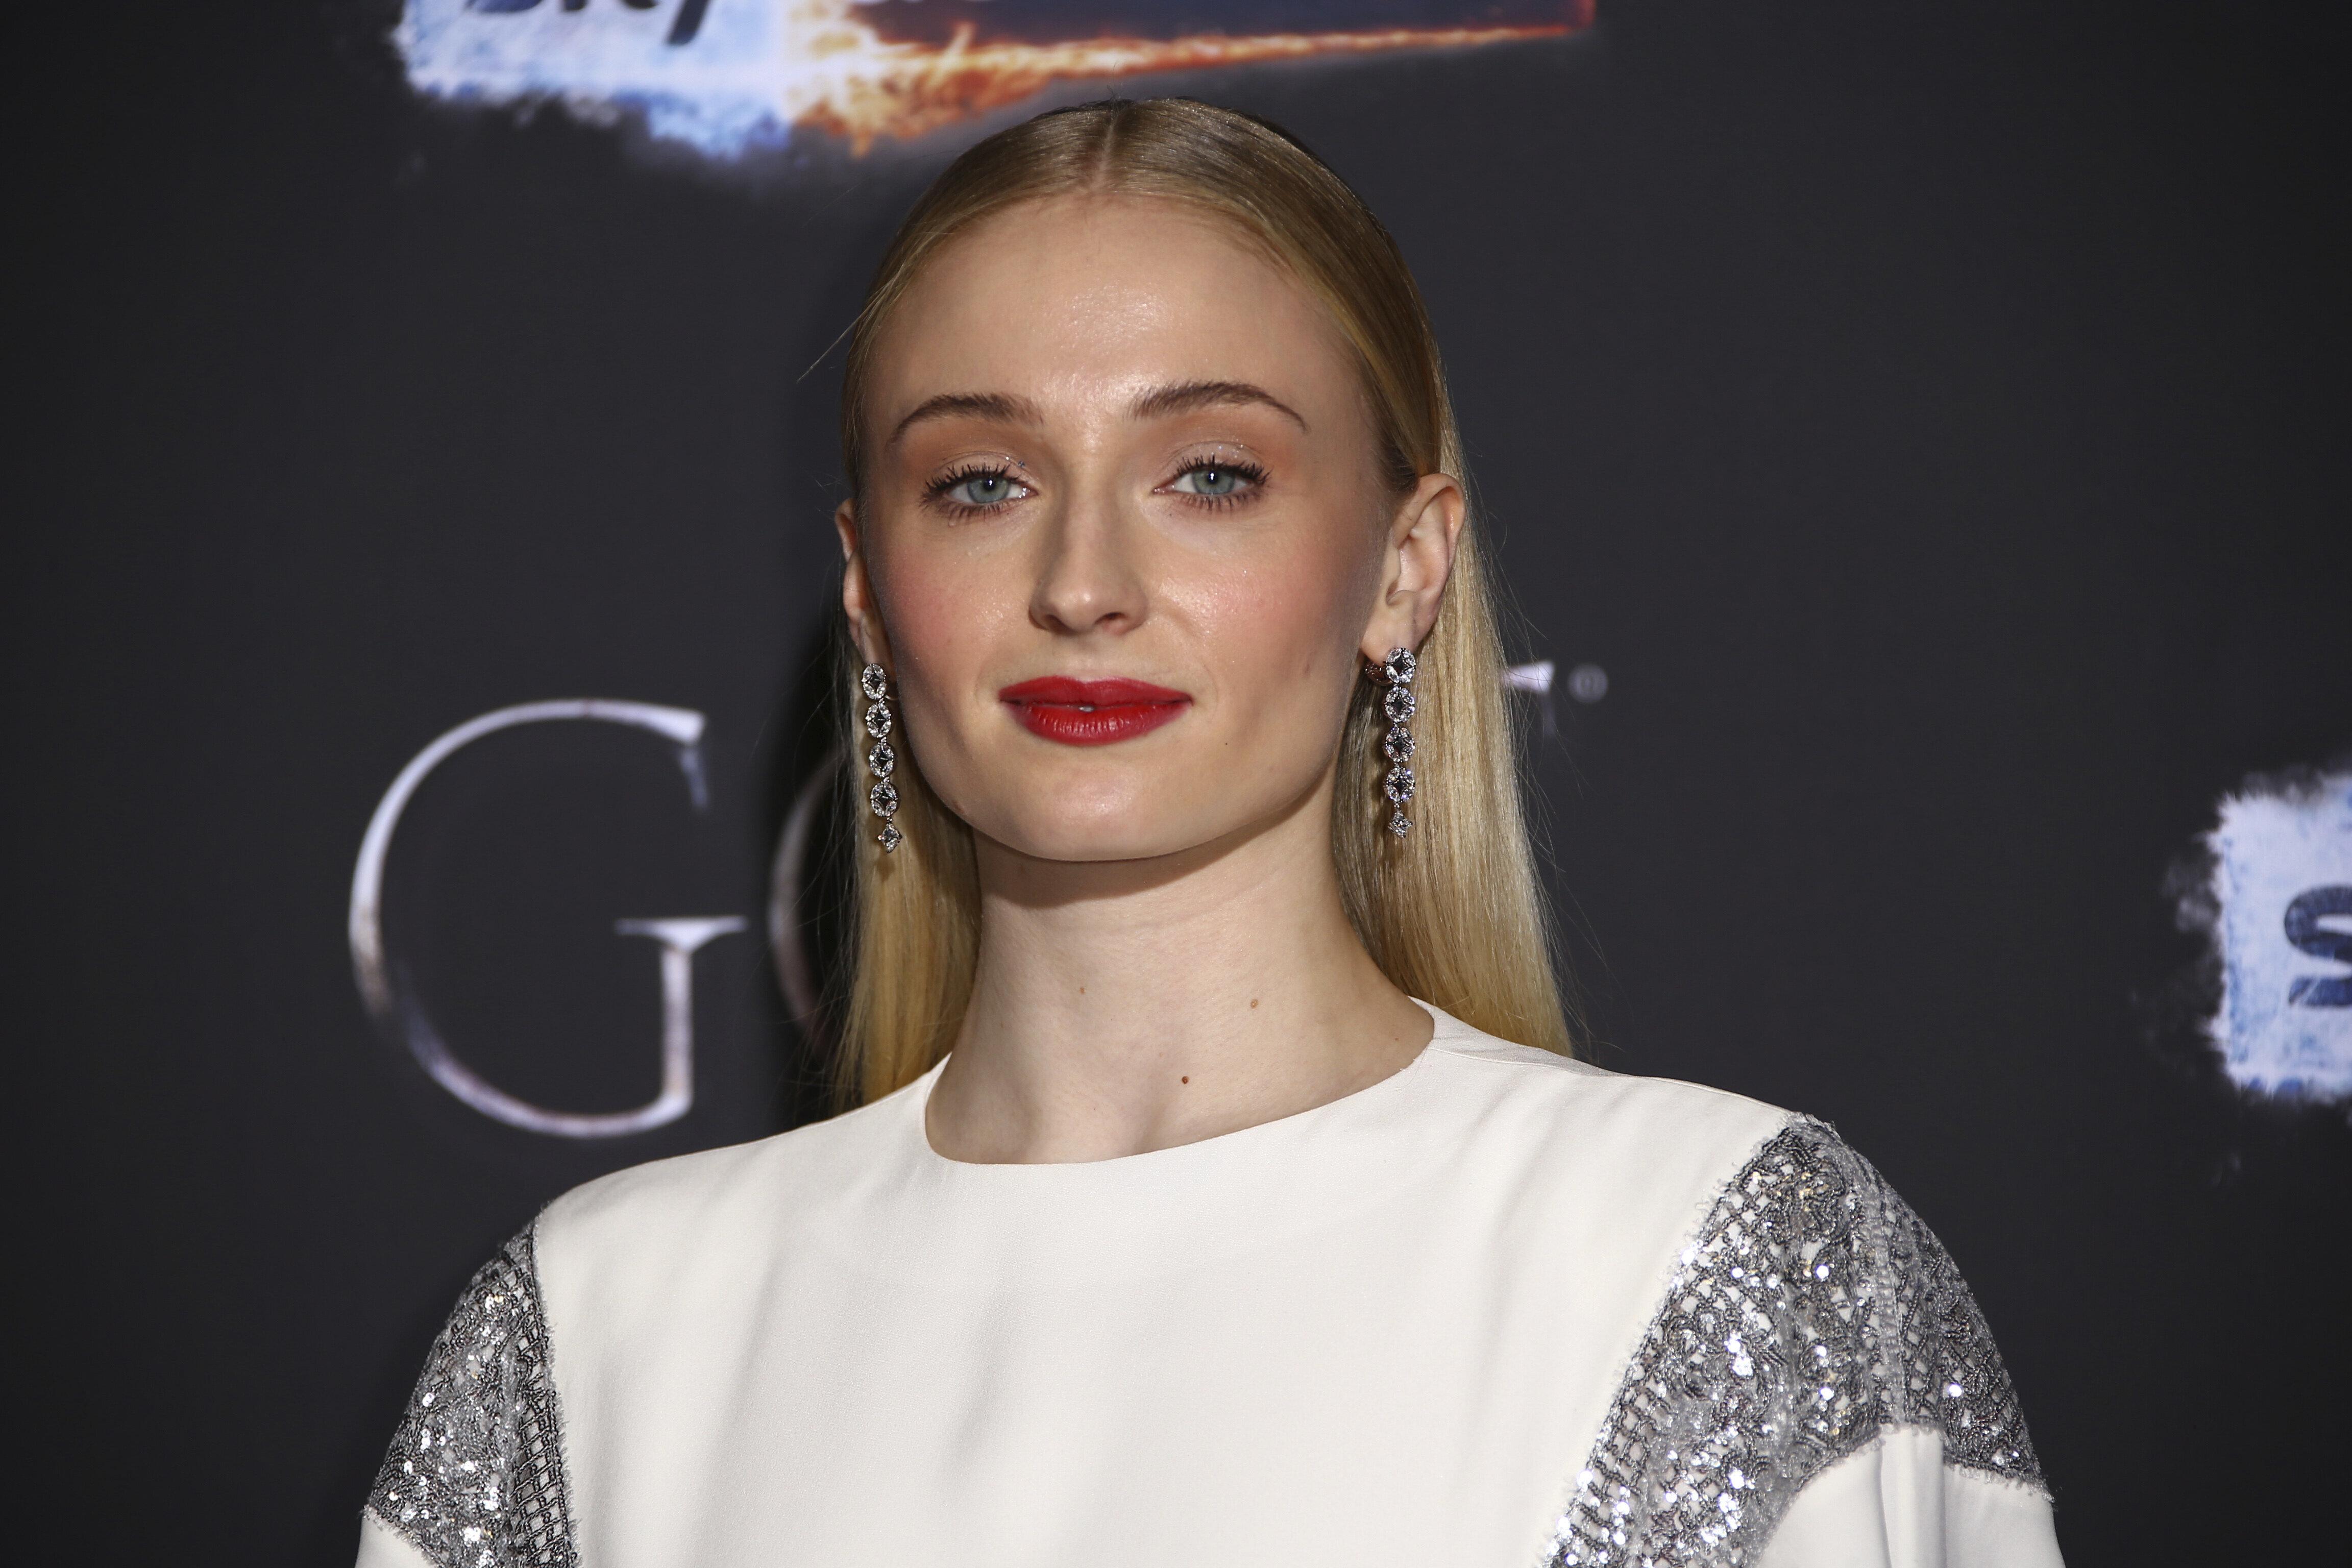 «Game of Thrones»: Πόσο «επώδυνο» θα είναι το φινάλε; Η απάντηση της Σόφι Τέρνερ στον Τζίμι